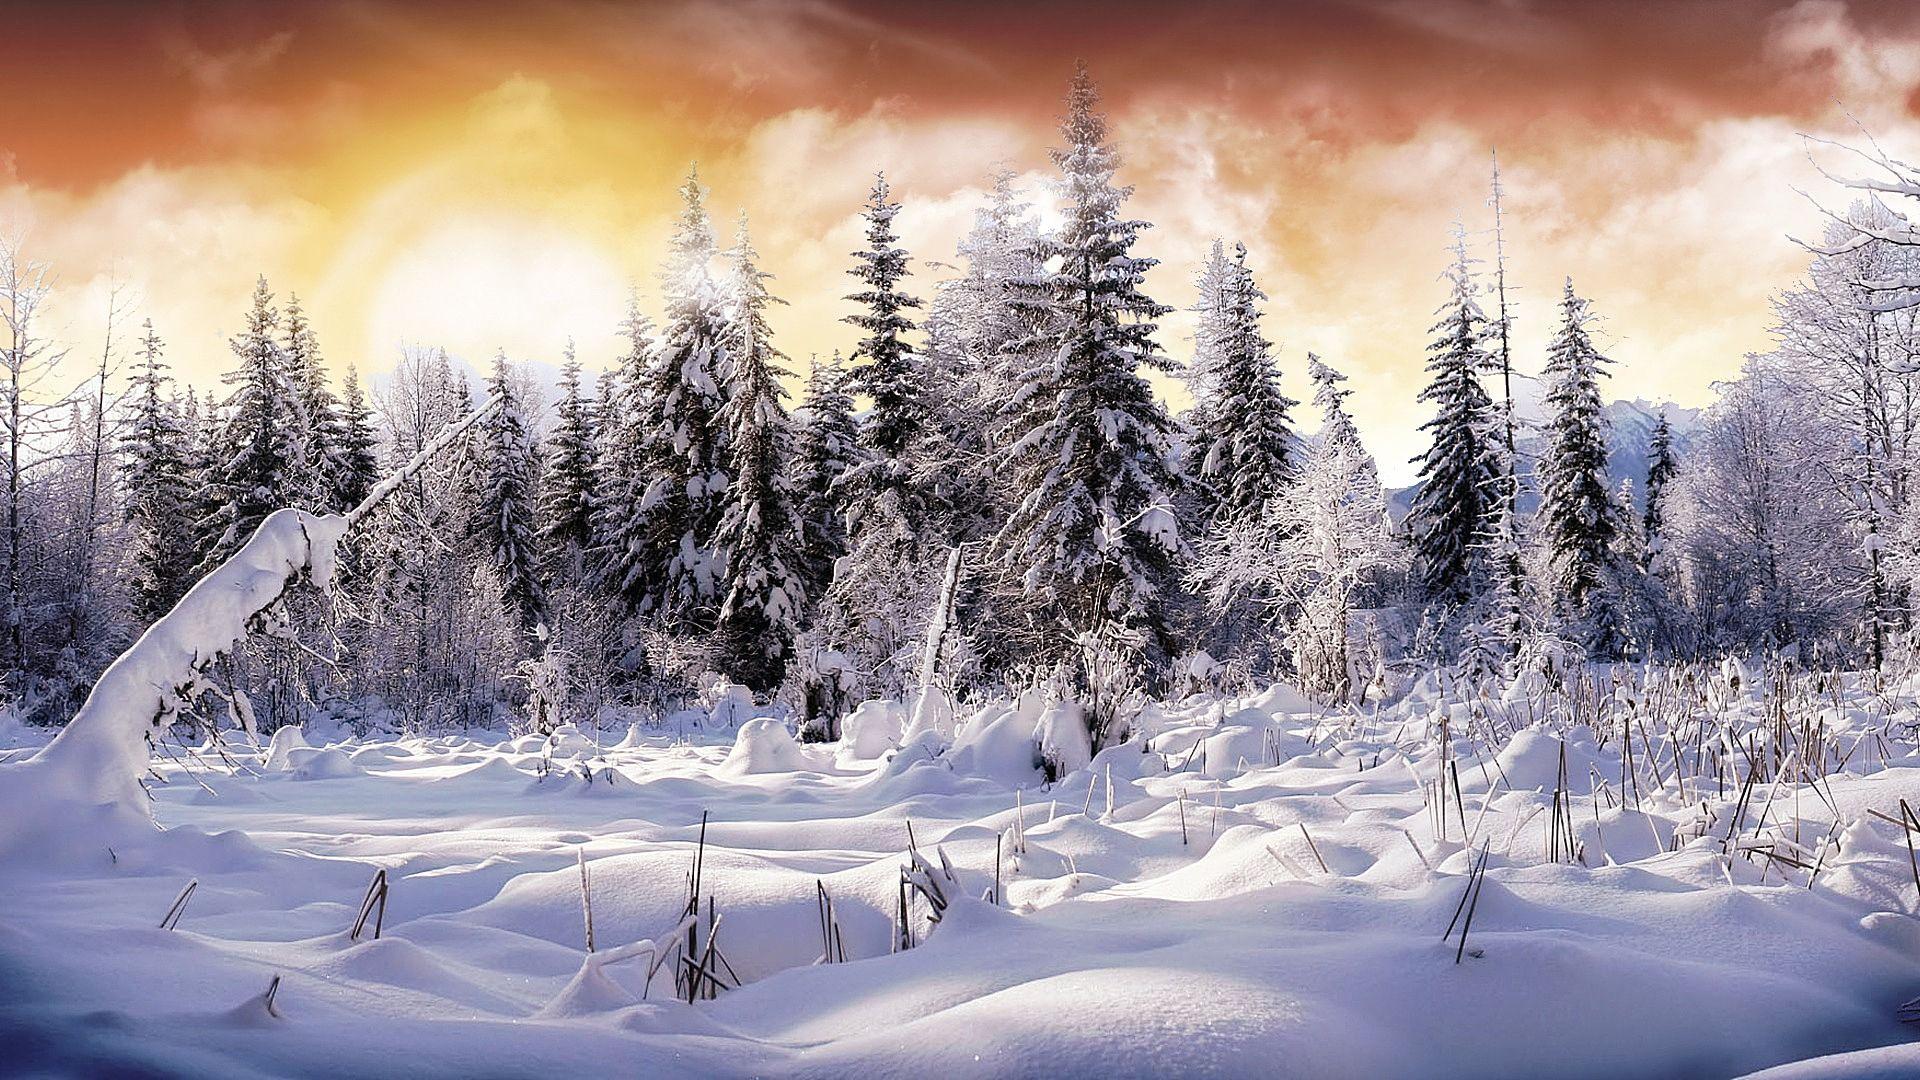 Winter Scene wallpaper download